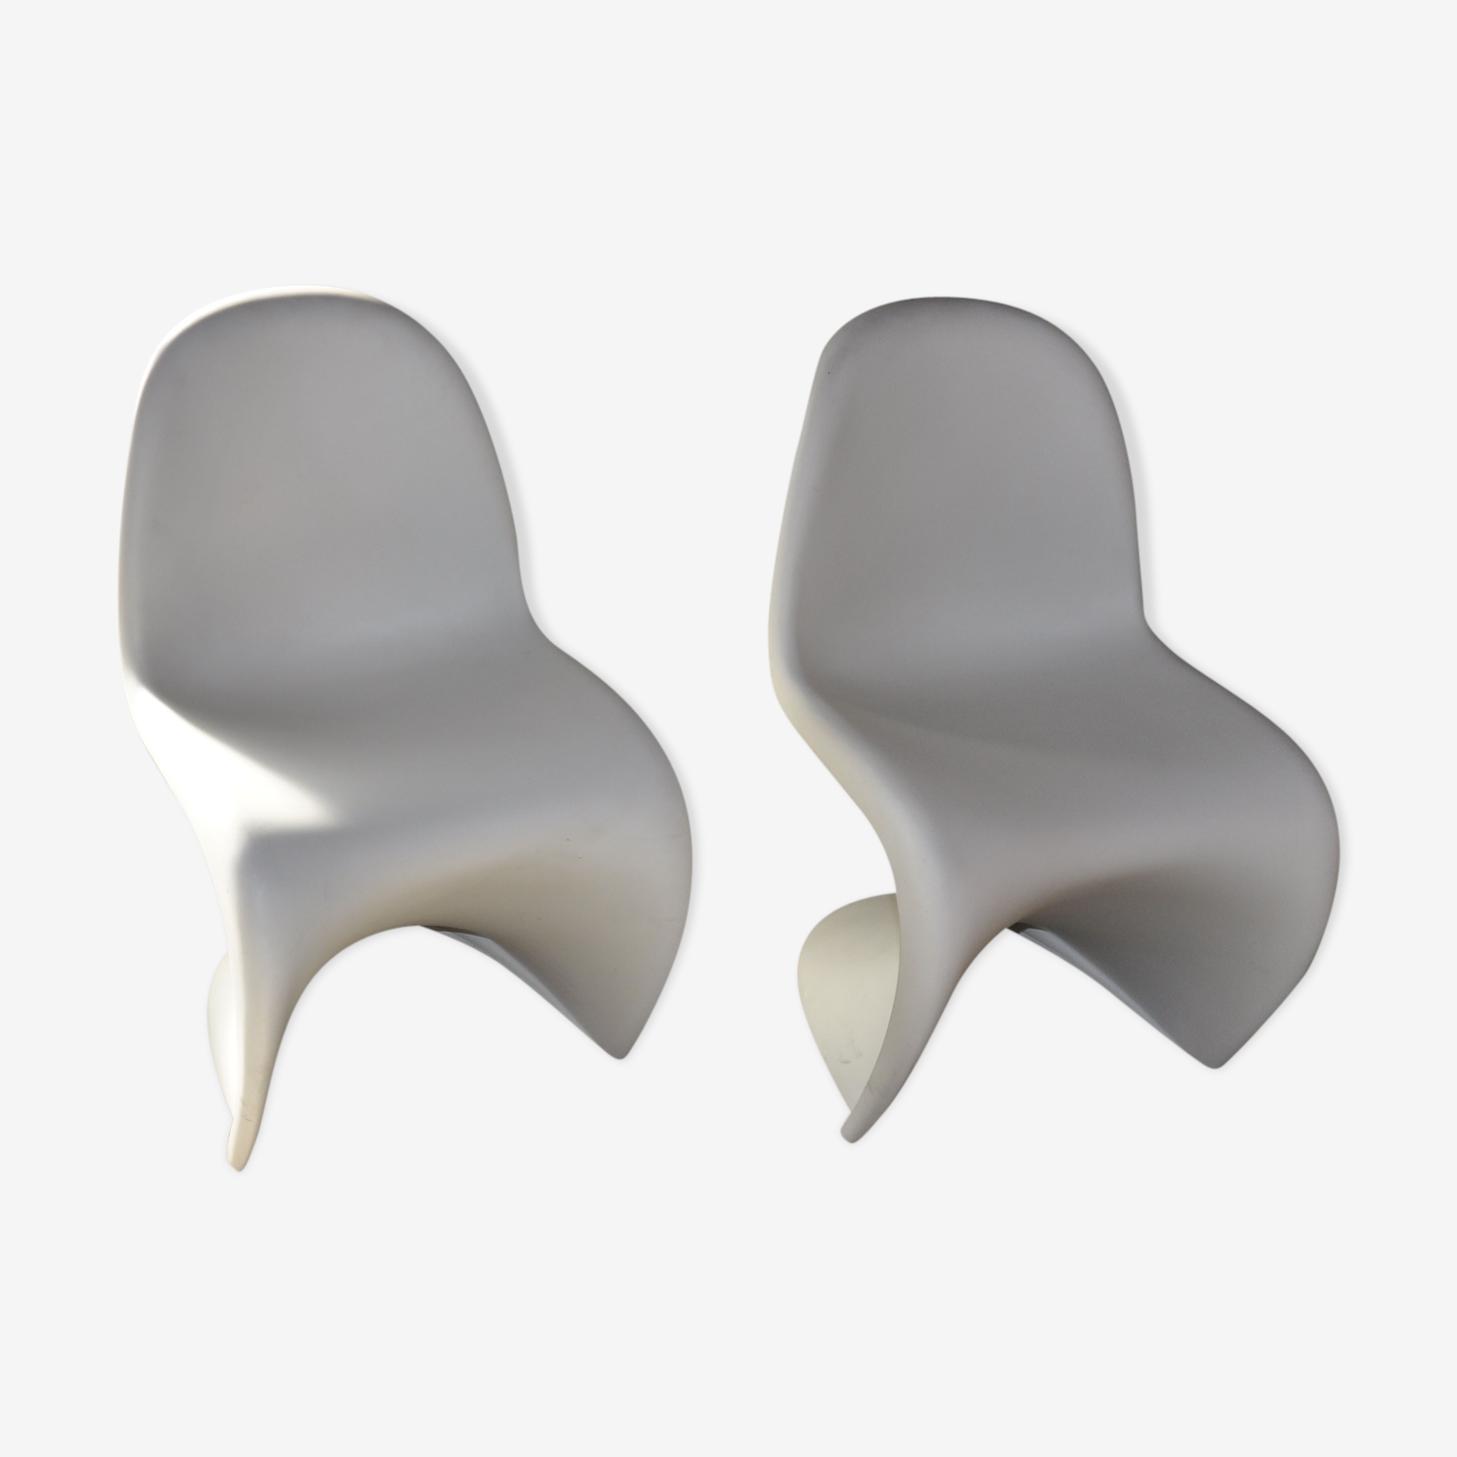 Pair of white chairs S Panton Vitra